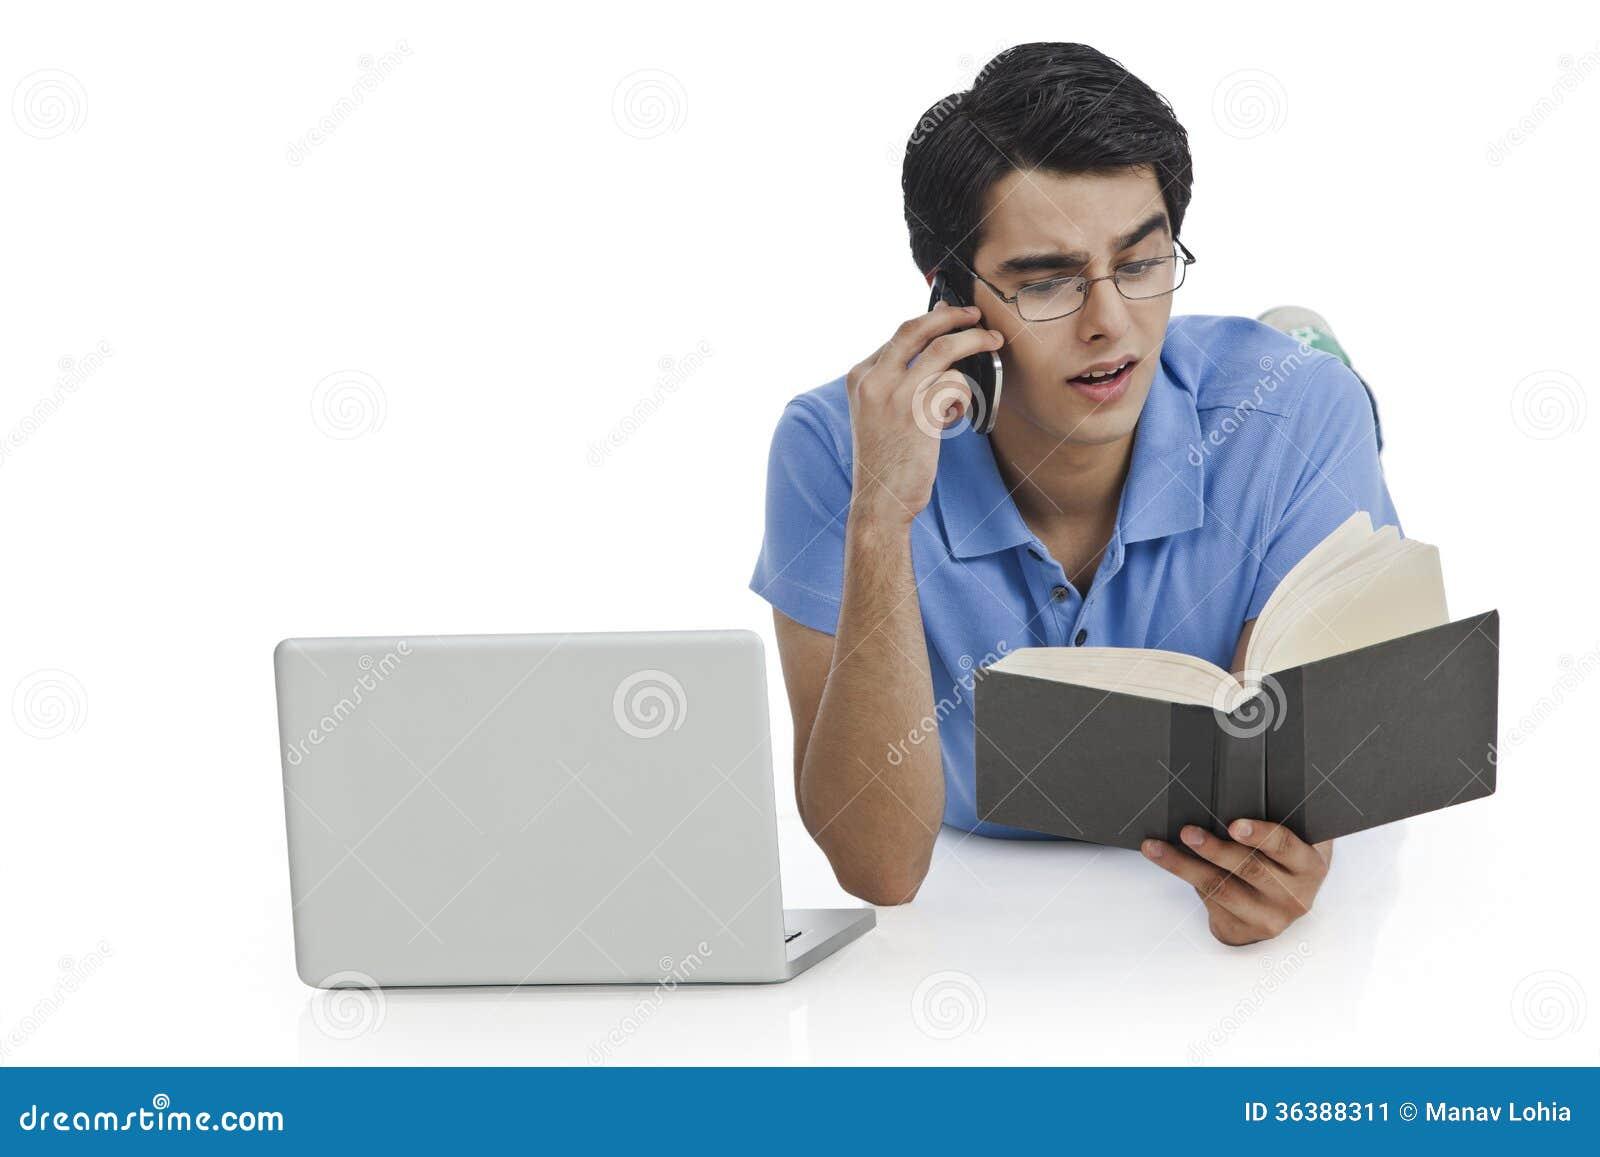 online joe celkos sql for smarties advanced